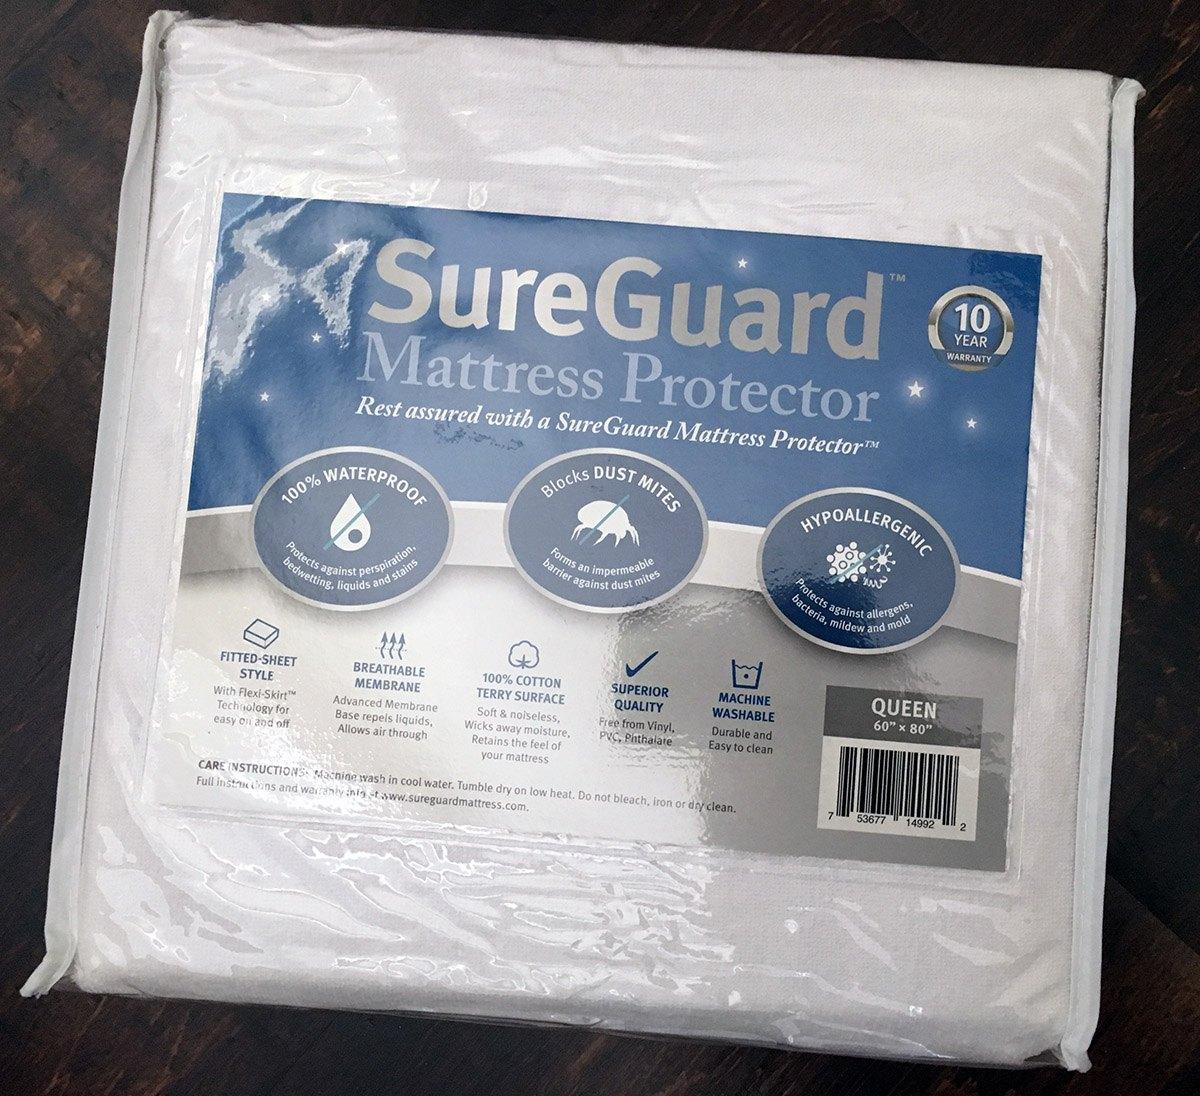 SureGuard Mattress Protector Review